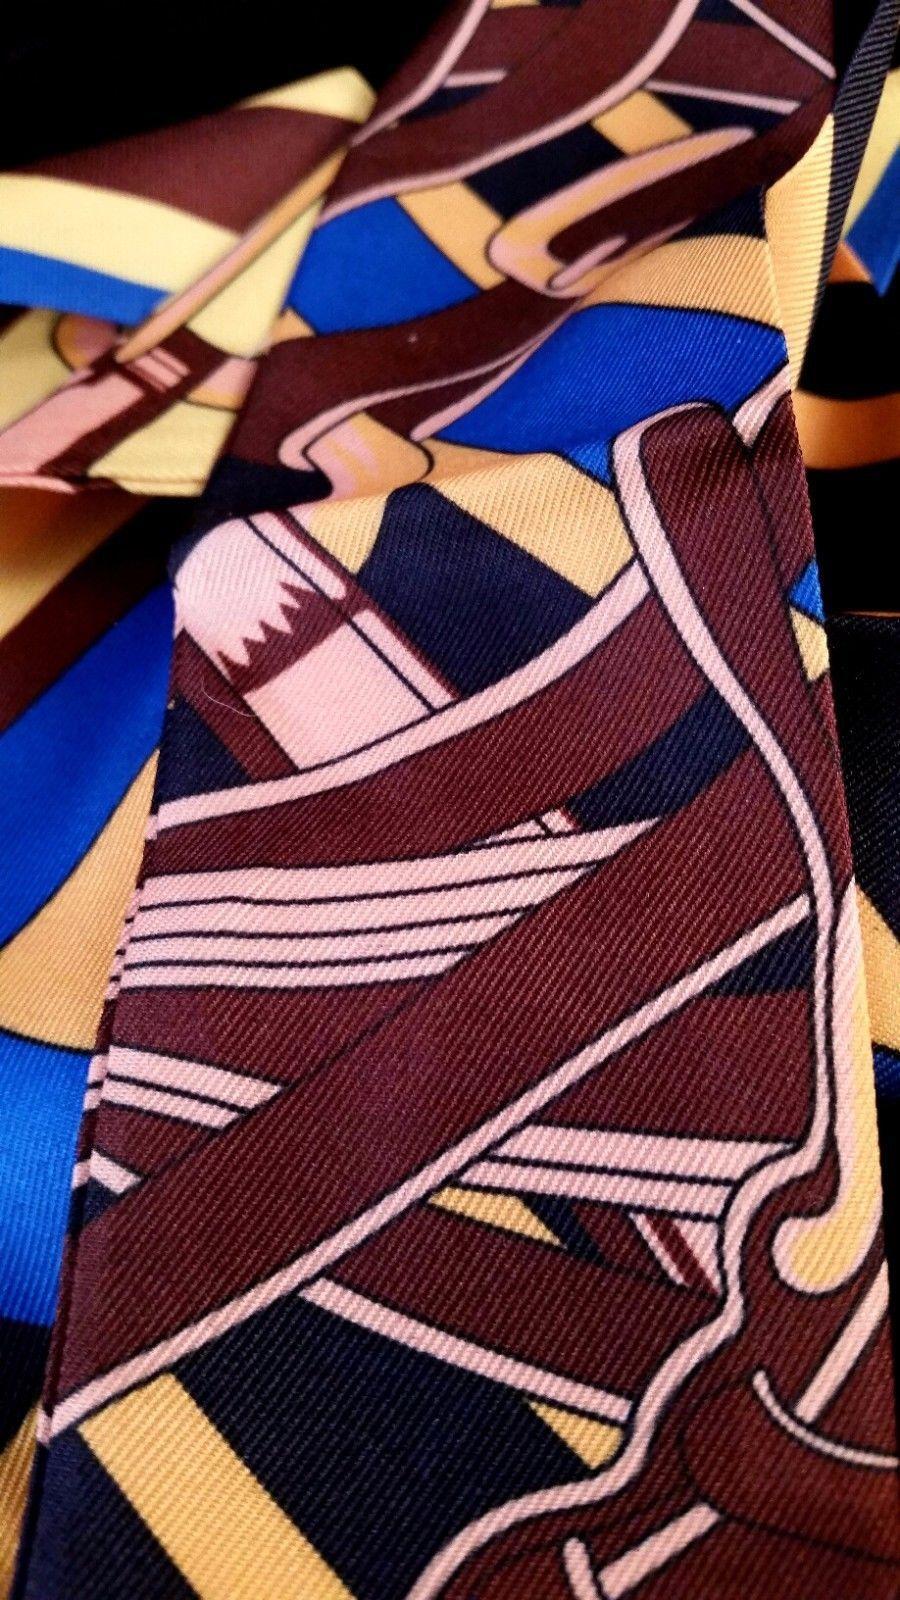 St. Germain Twilly Scarf Blue Gold Brown Buckle Purse Twill Luxury Equestrian